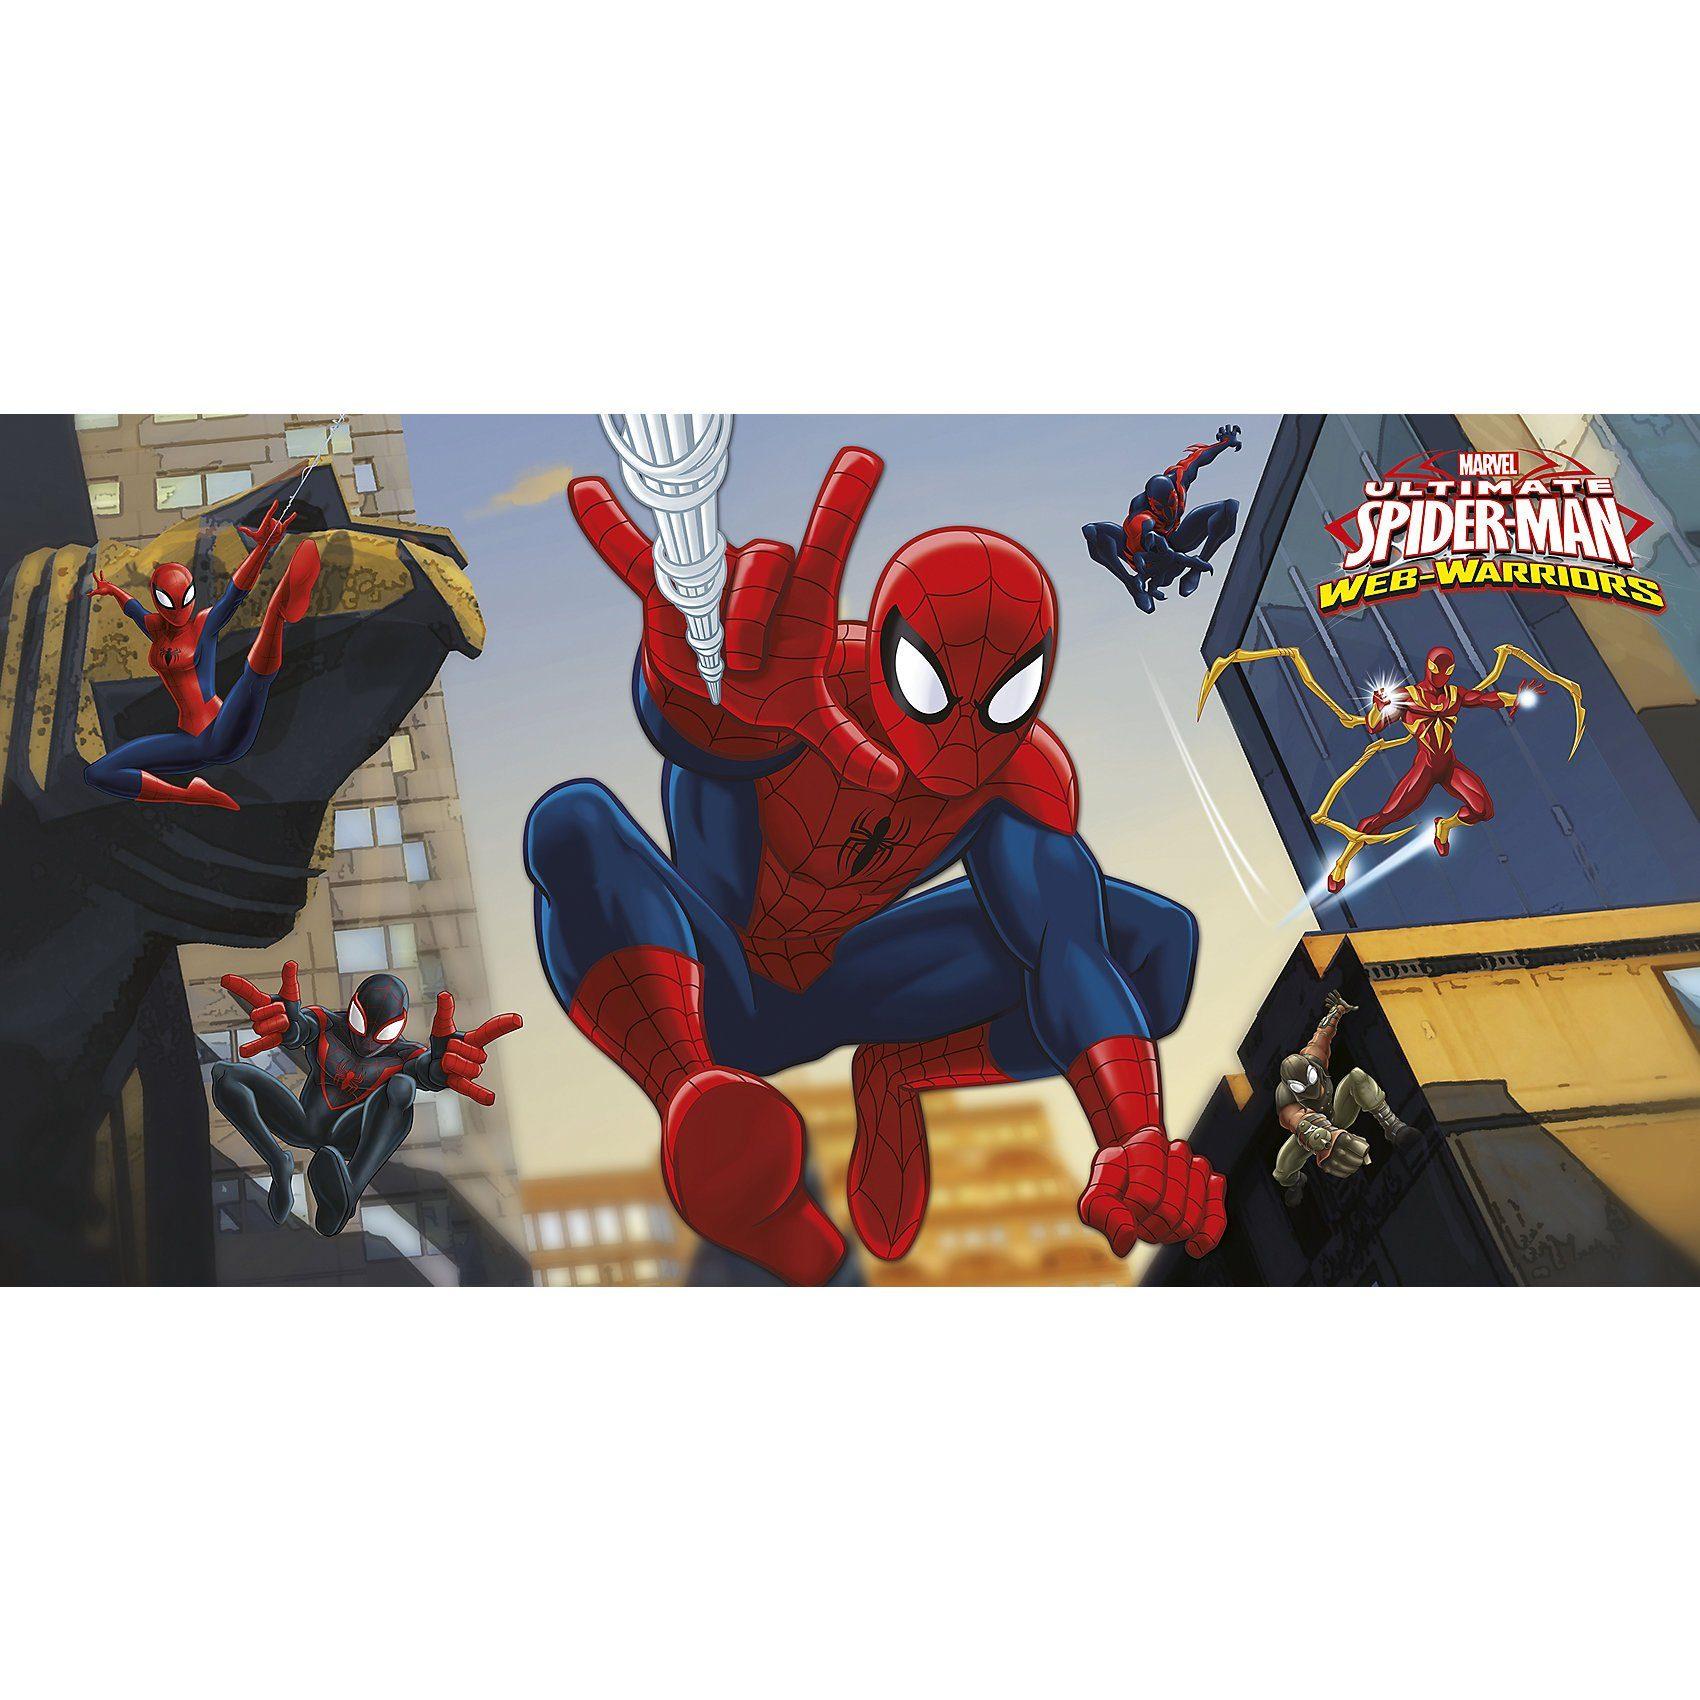 Procos Scene Setter Spider-Man